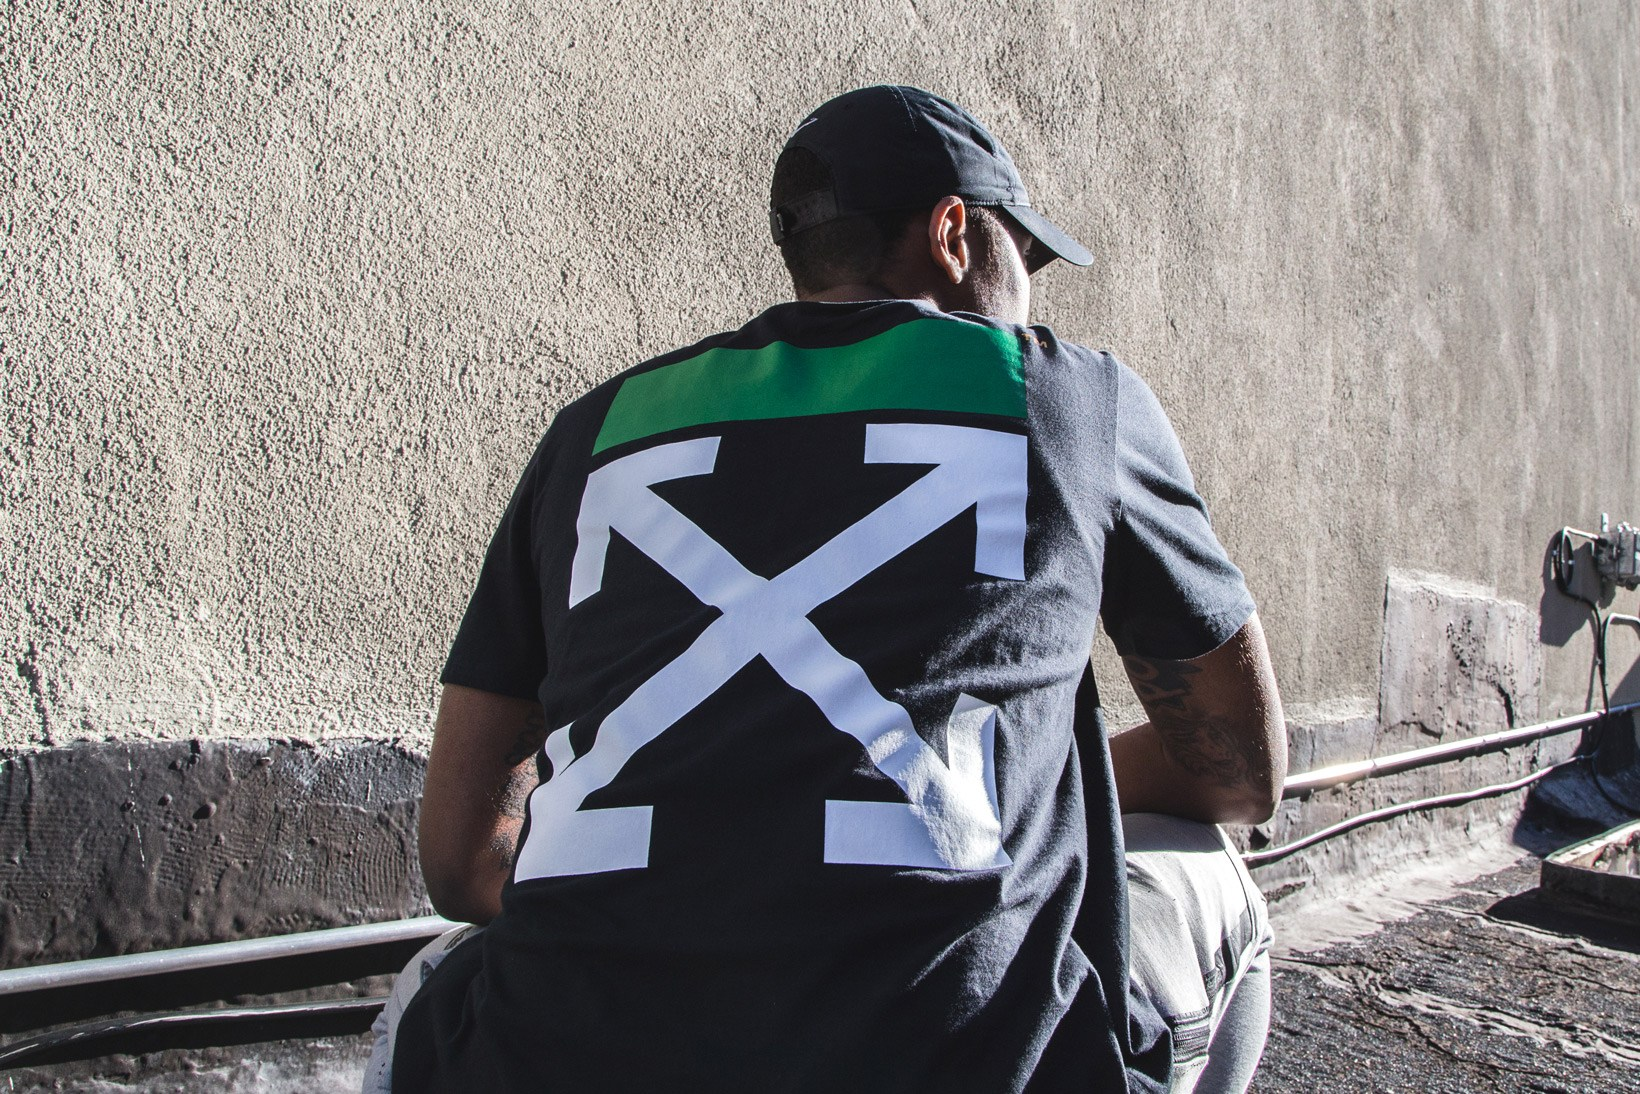 nike-off-white-virgil-abloh-equality-t-shirt-1-2